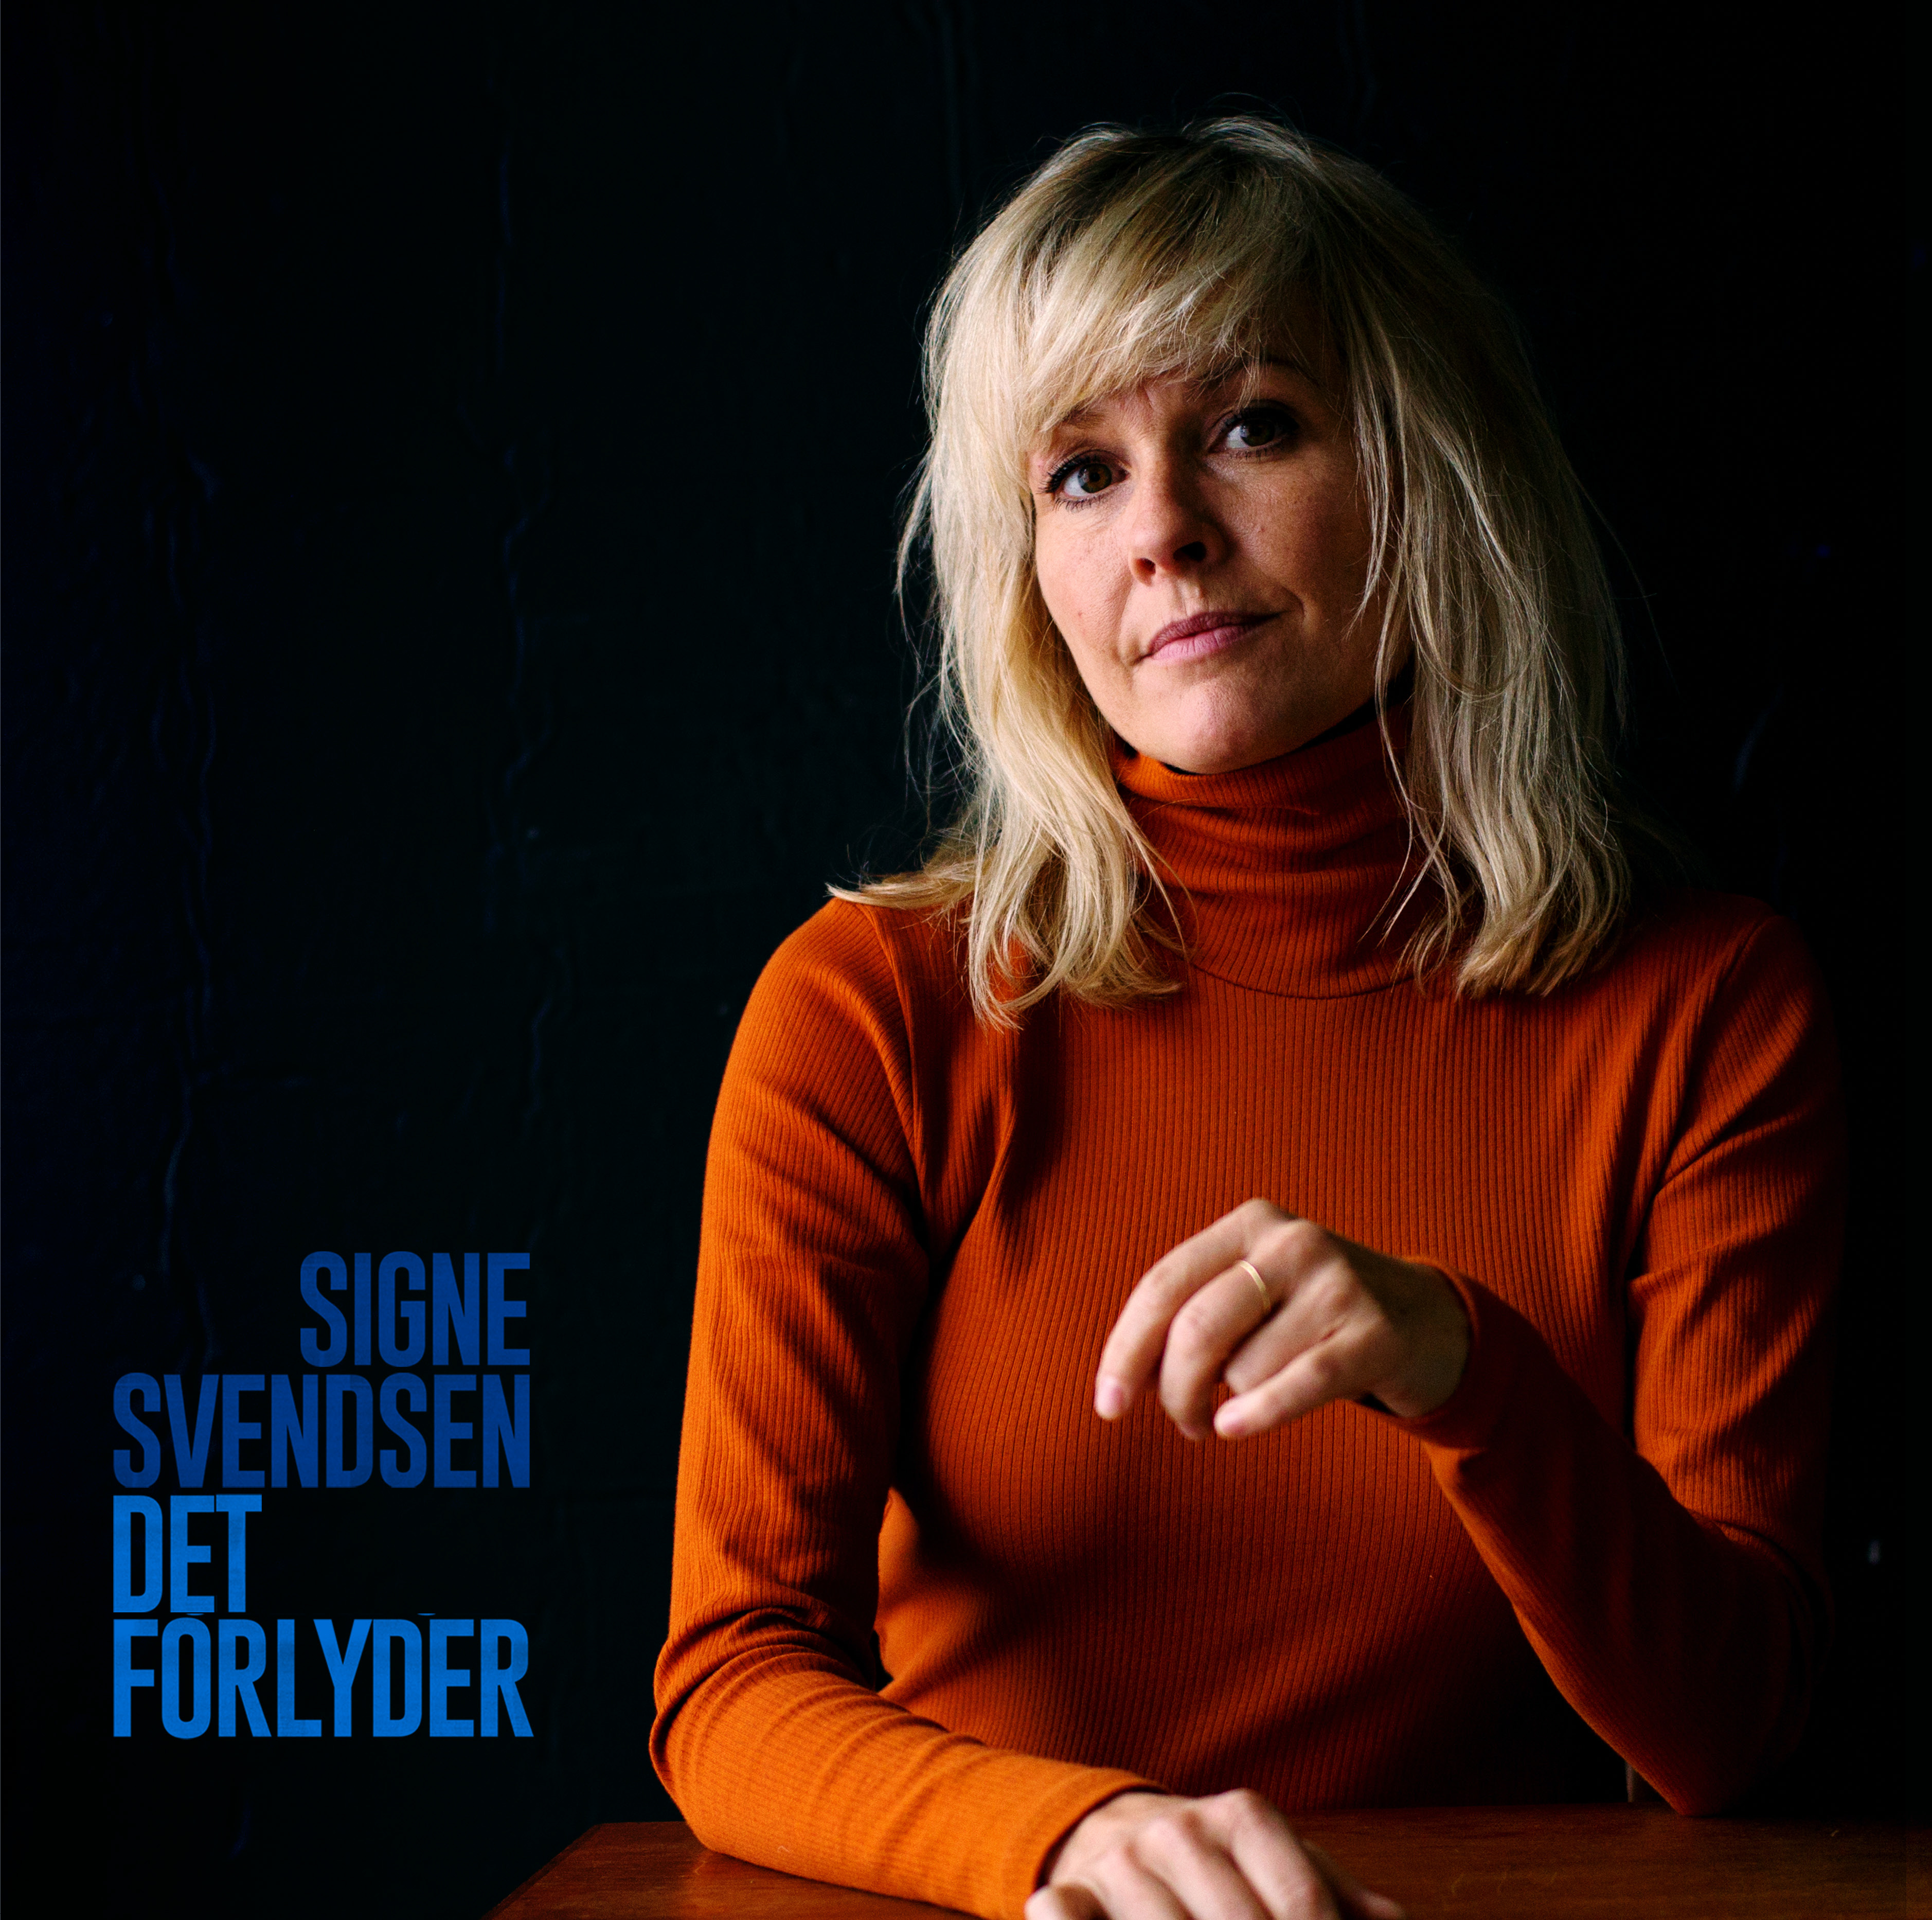 Det Forlyder - Signe Svendsen - Musik -  - 5707785011300 - 31/1-2020